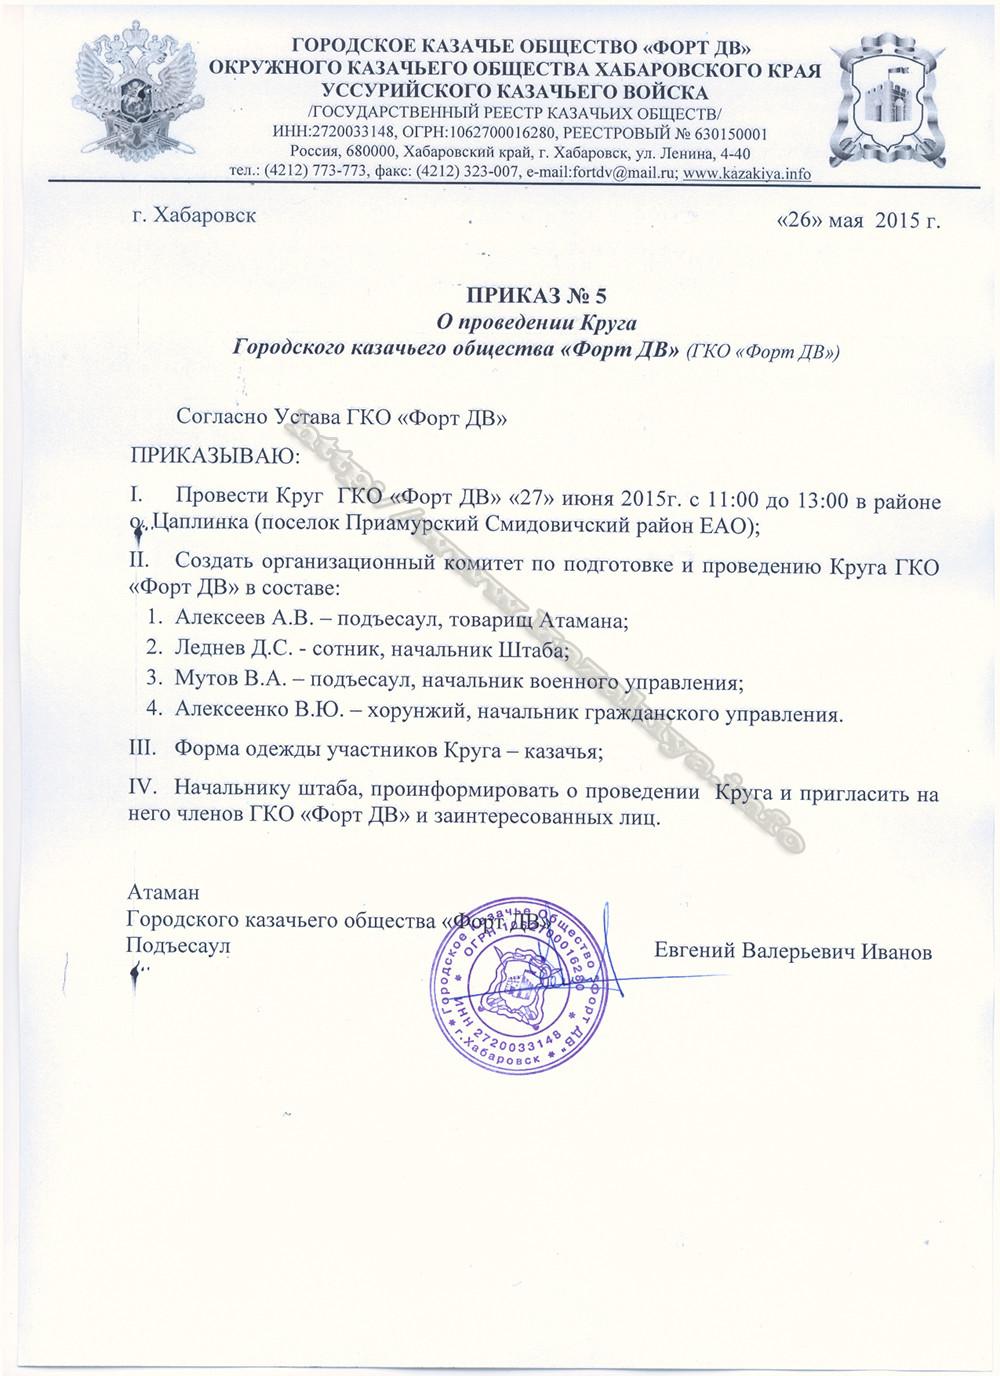 приказ-по-Кругу-Форт-ДВ-27-июня-2015.jpg